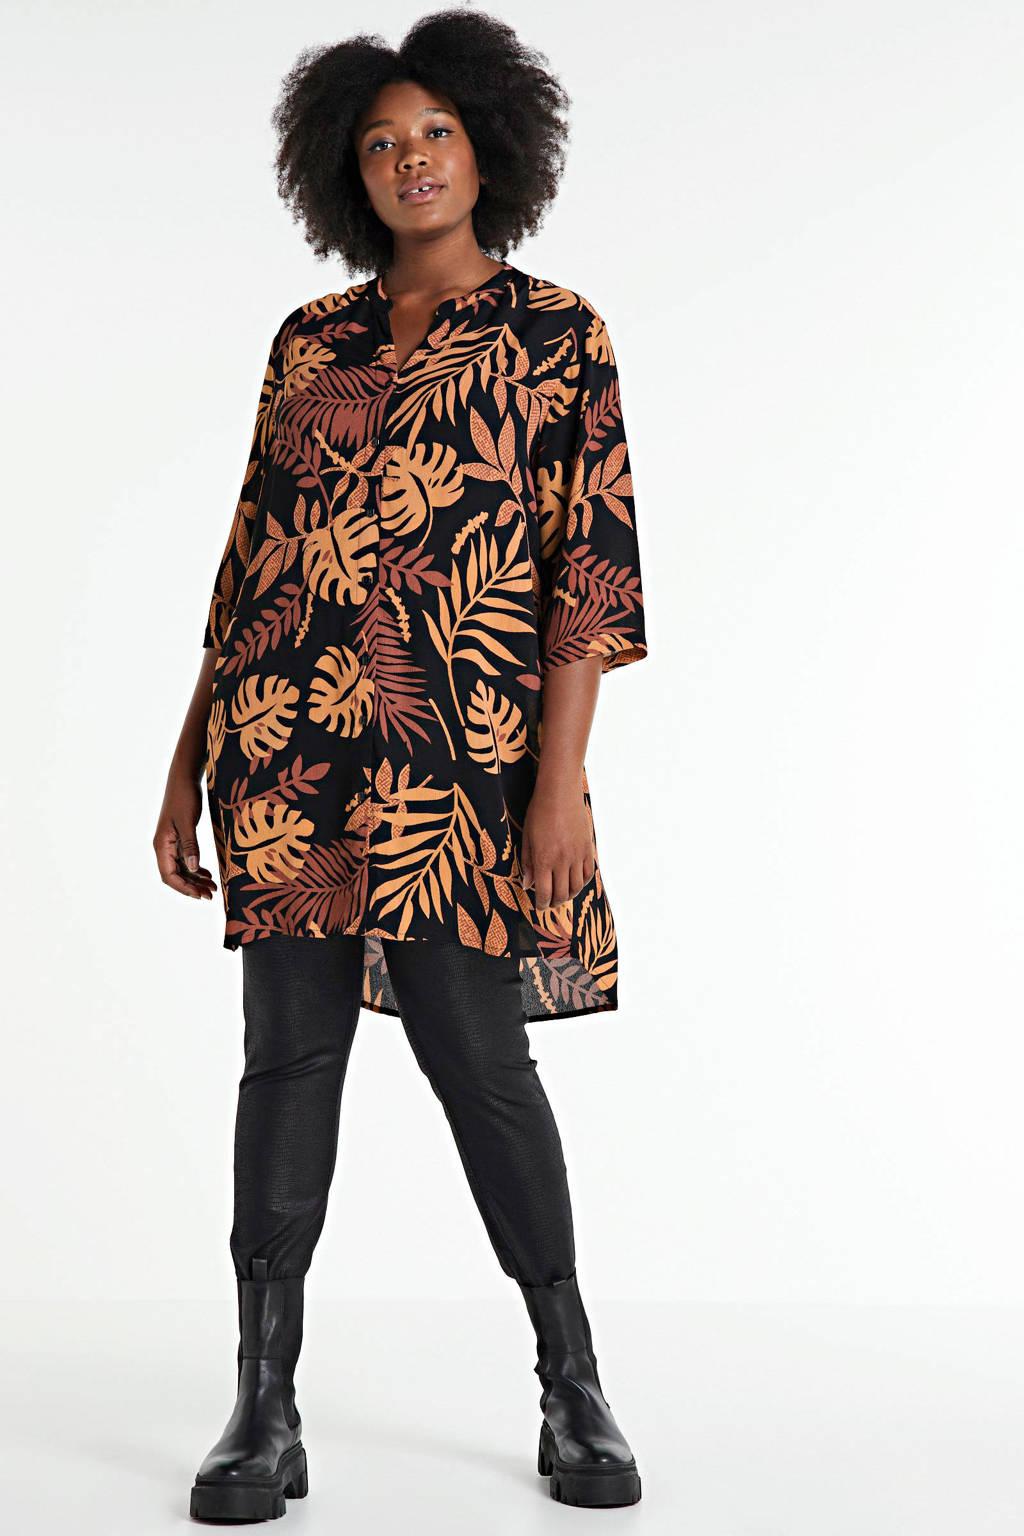 CHOISE tuniek met bladprint zwart/oranje/donkerrood, Zwart/oranje/donkerrood